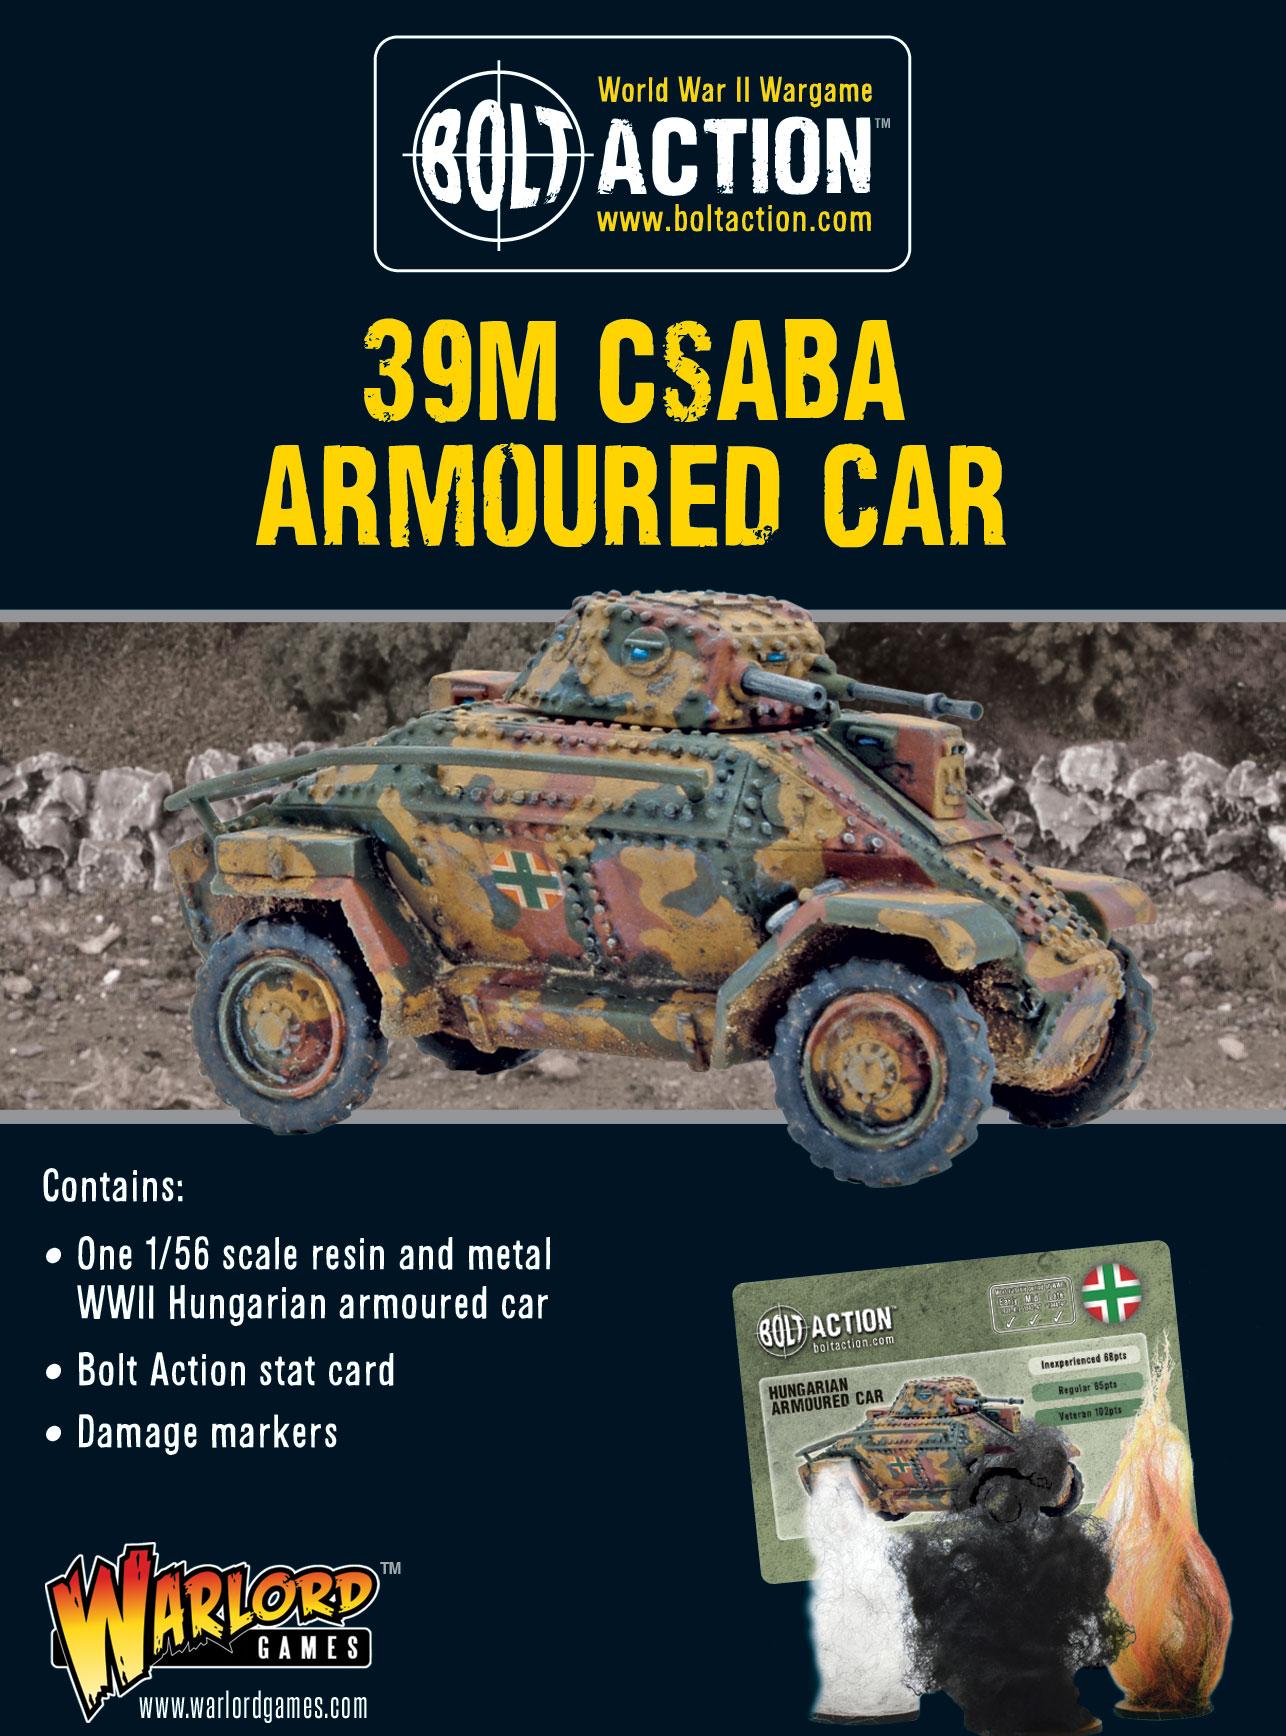 402417401-39M-Csaba-armoured-car_GW3_RTE.jpg